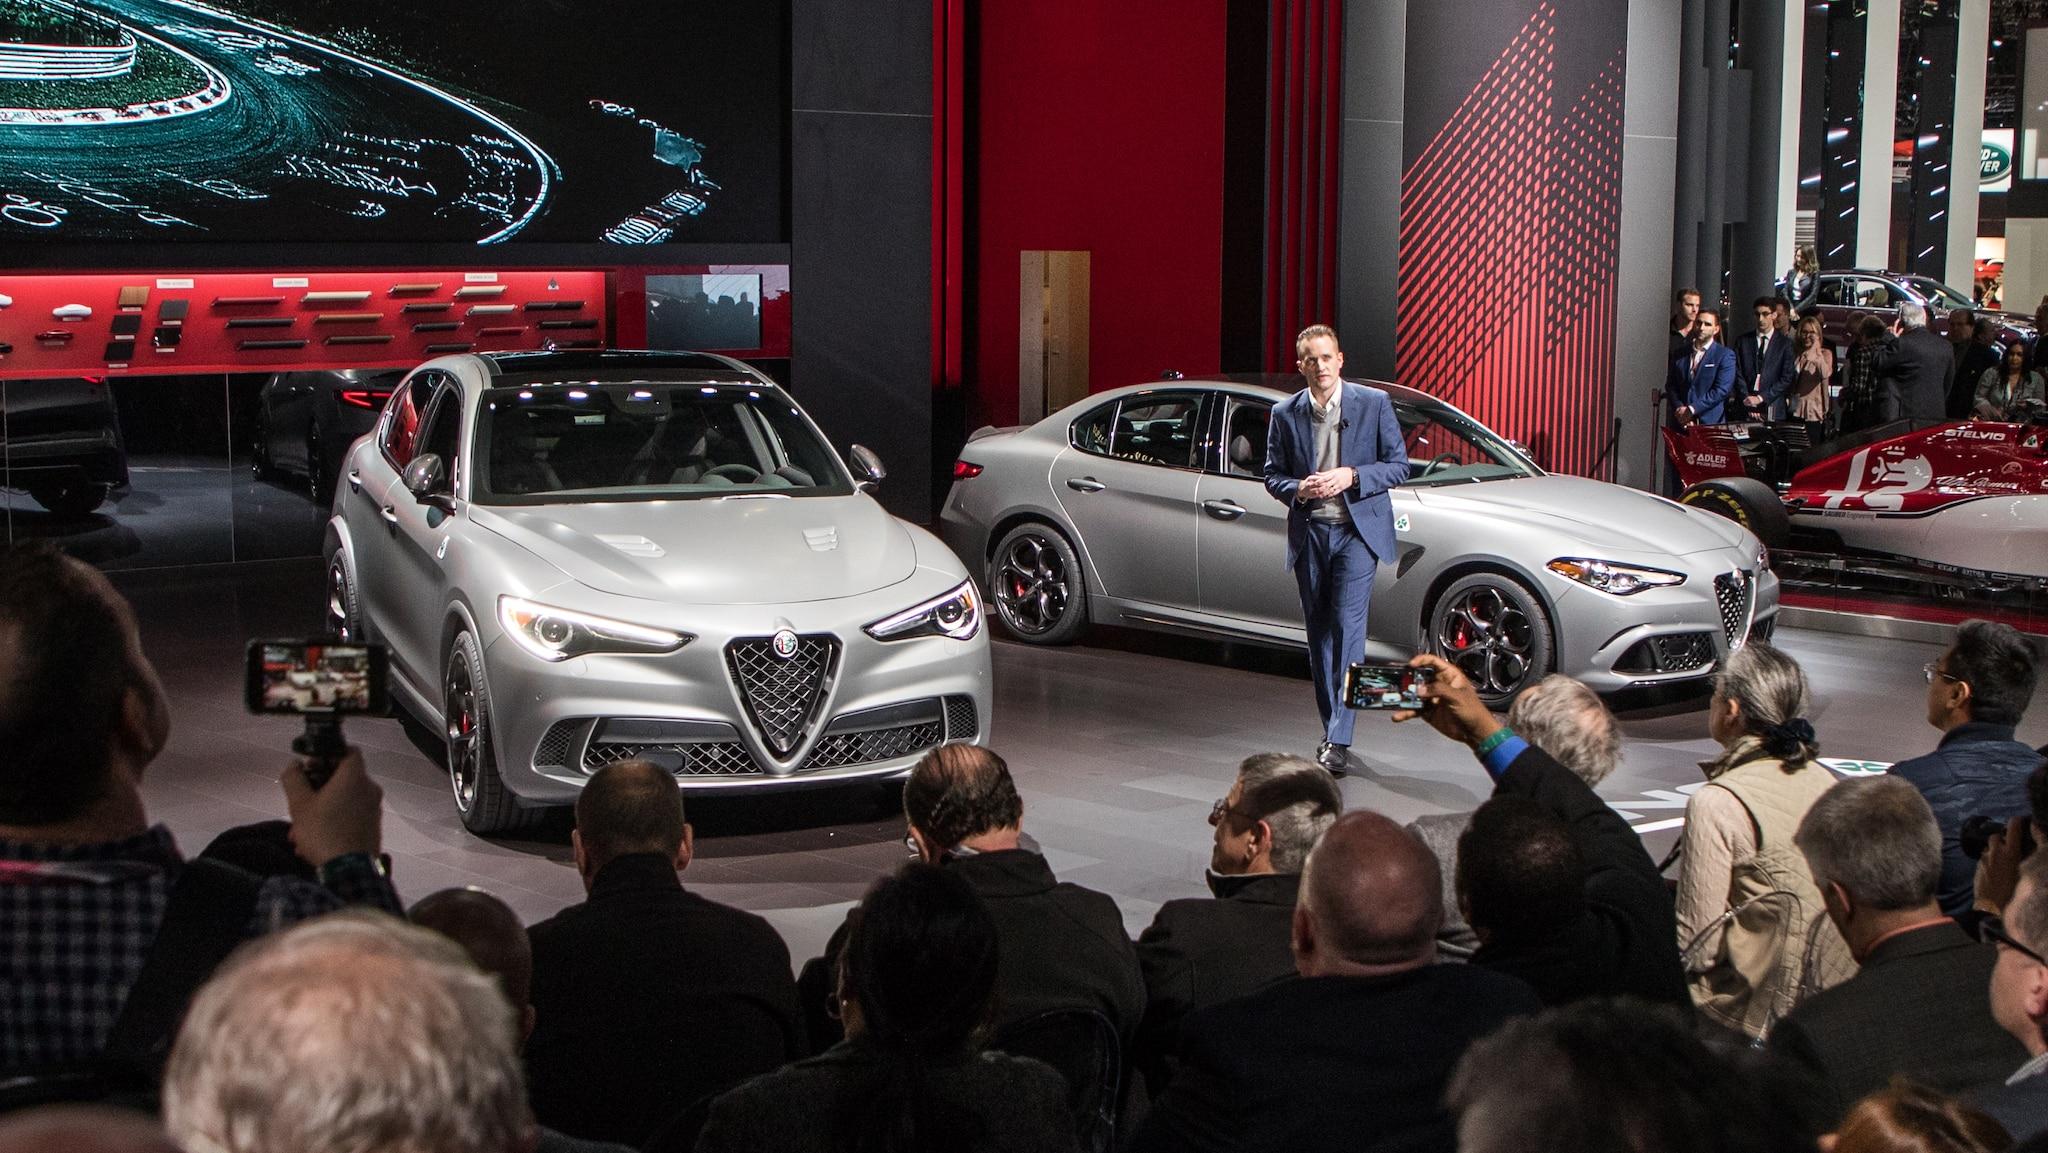 2020 Alfa Romeo Giulia And Stelvio NRING Editions